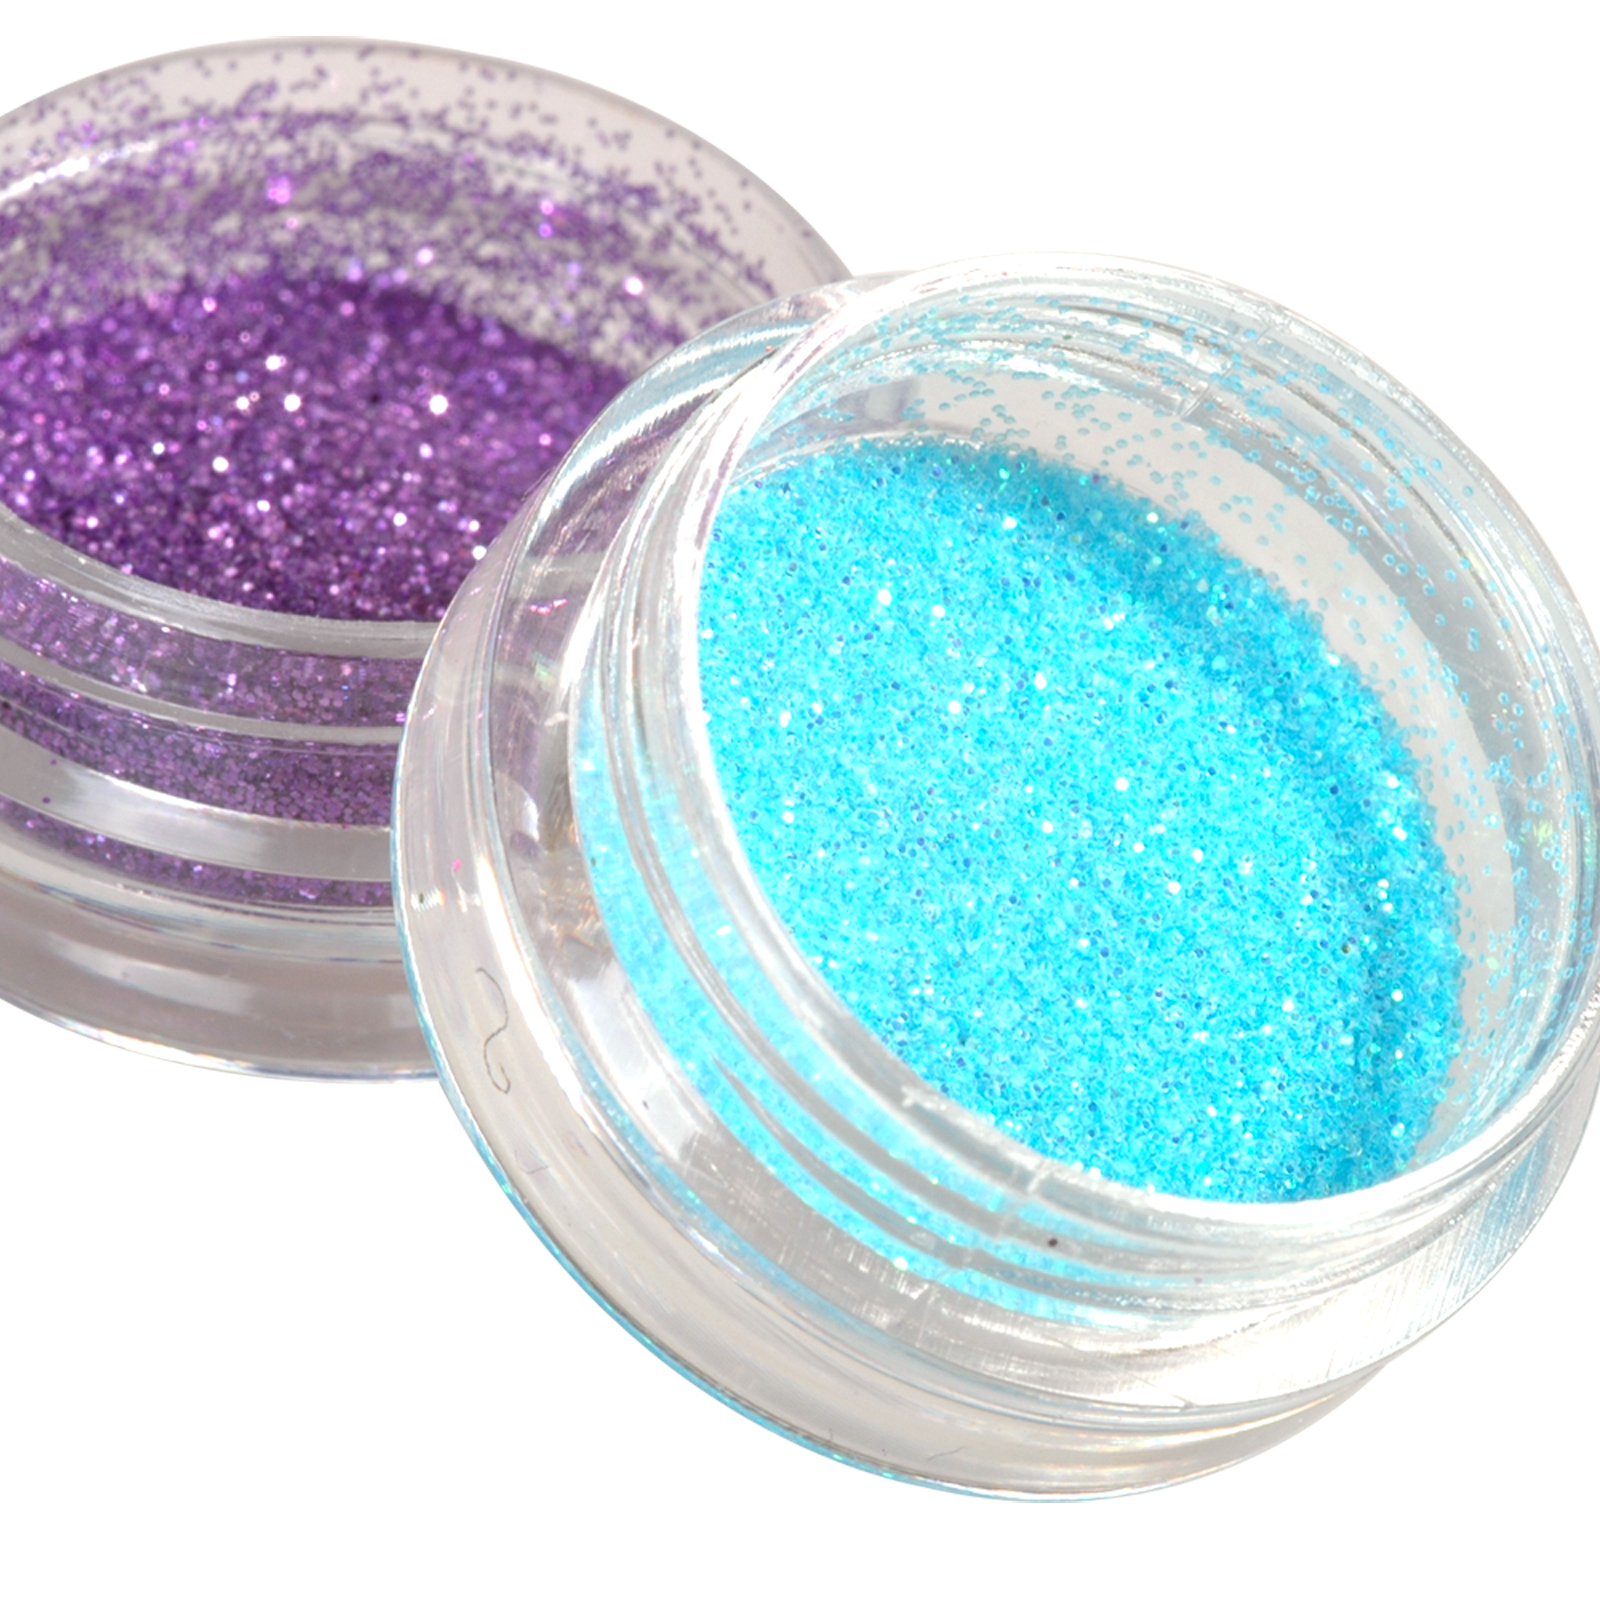 48 colors glitter nail art dust kit uv acrylic sparkle bright powder ebay. Black Bedroom Furniture Sets. Home Design Ideas